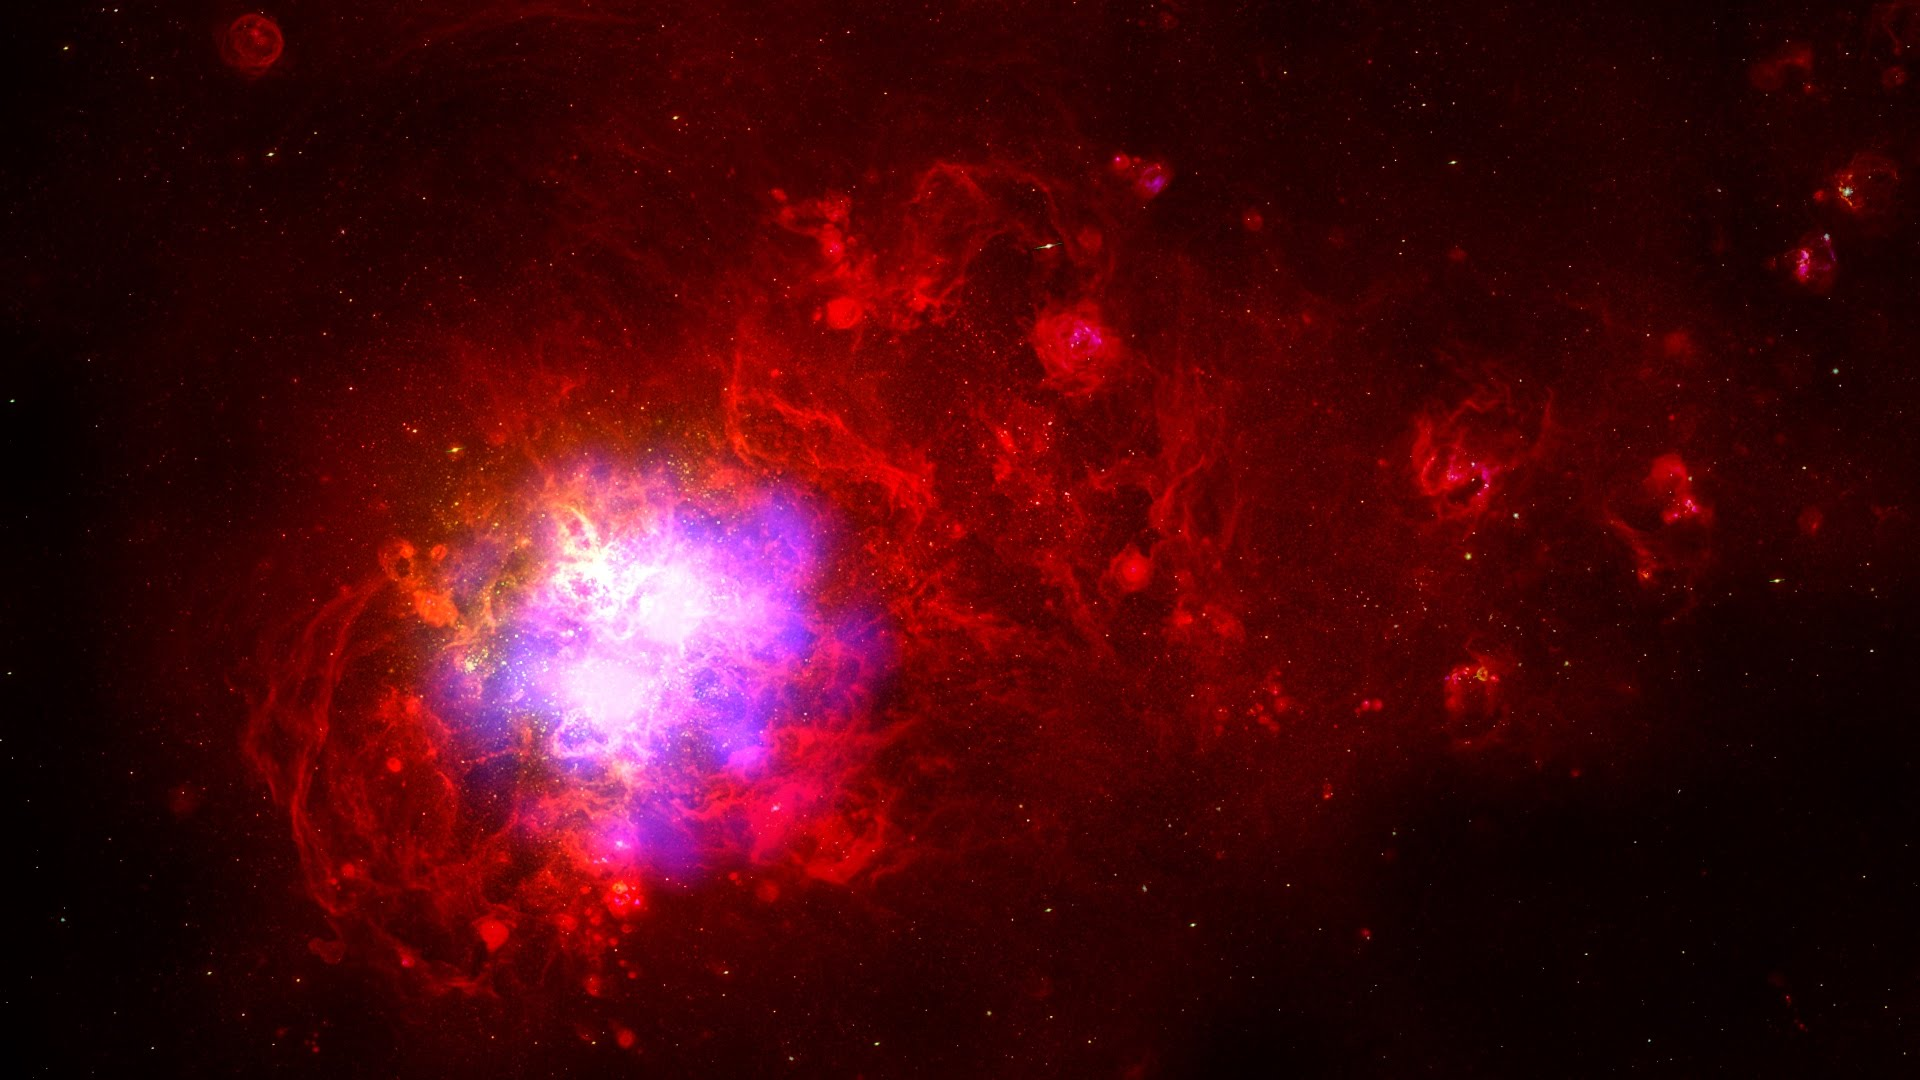 Pulsar J0540-6919